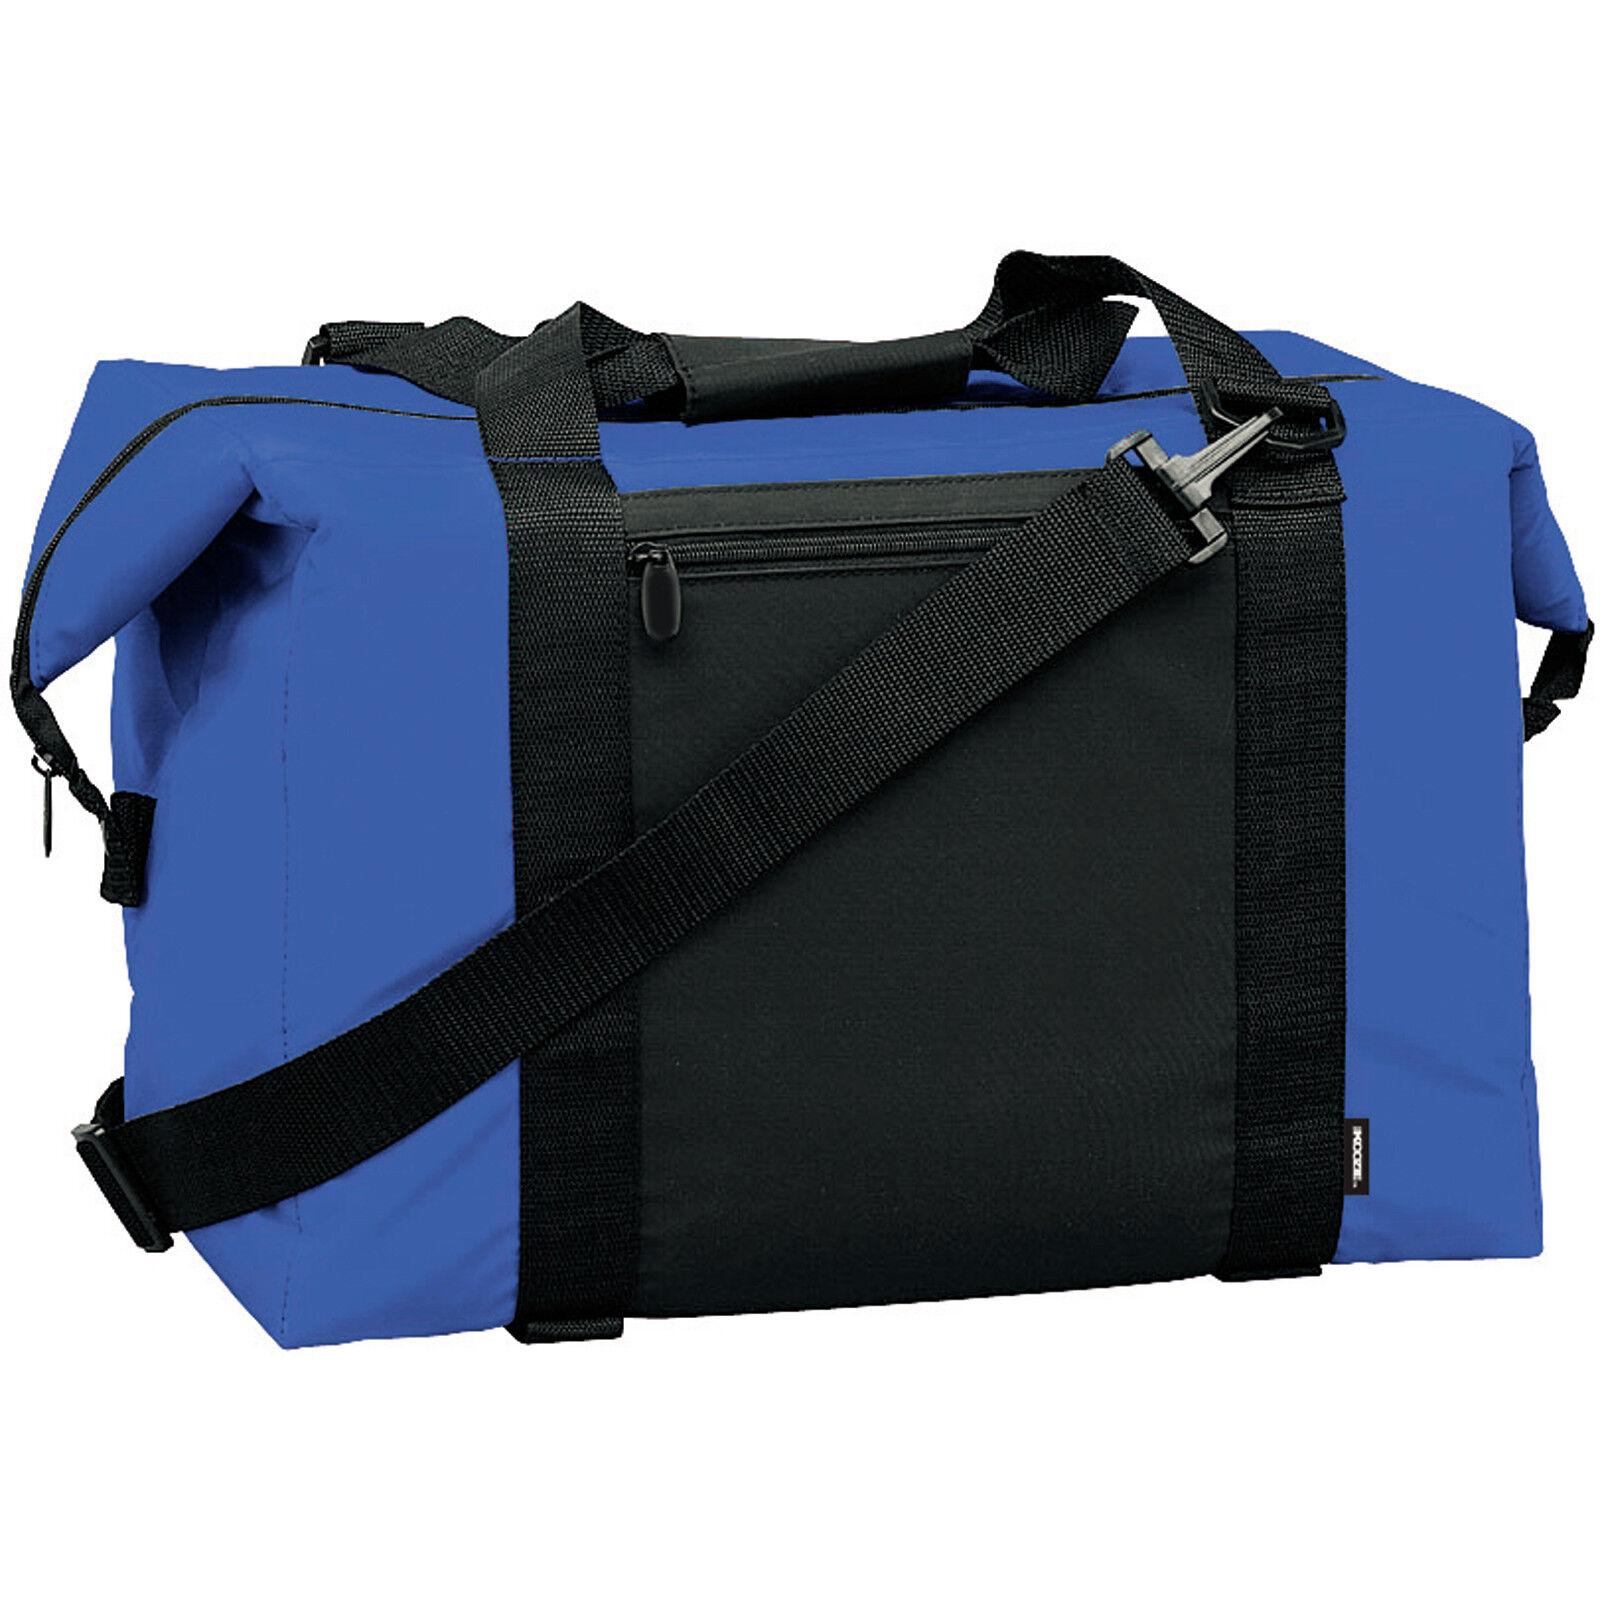 Koozie Koozie Koozie Grand Sac Réfrigérant Cooler Bag XXL - Boîte Déjeuner Canette 143257